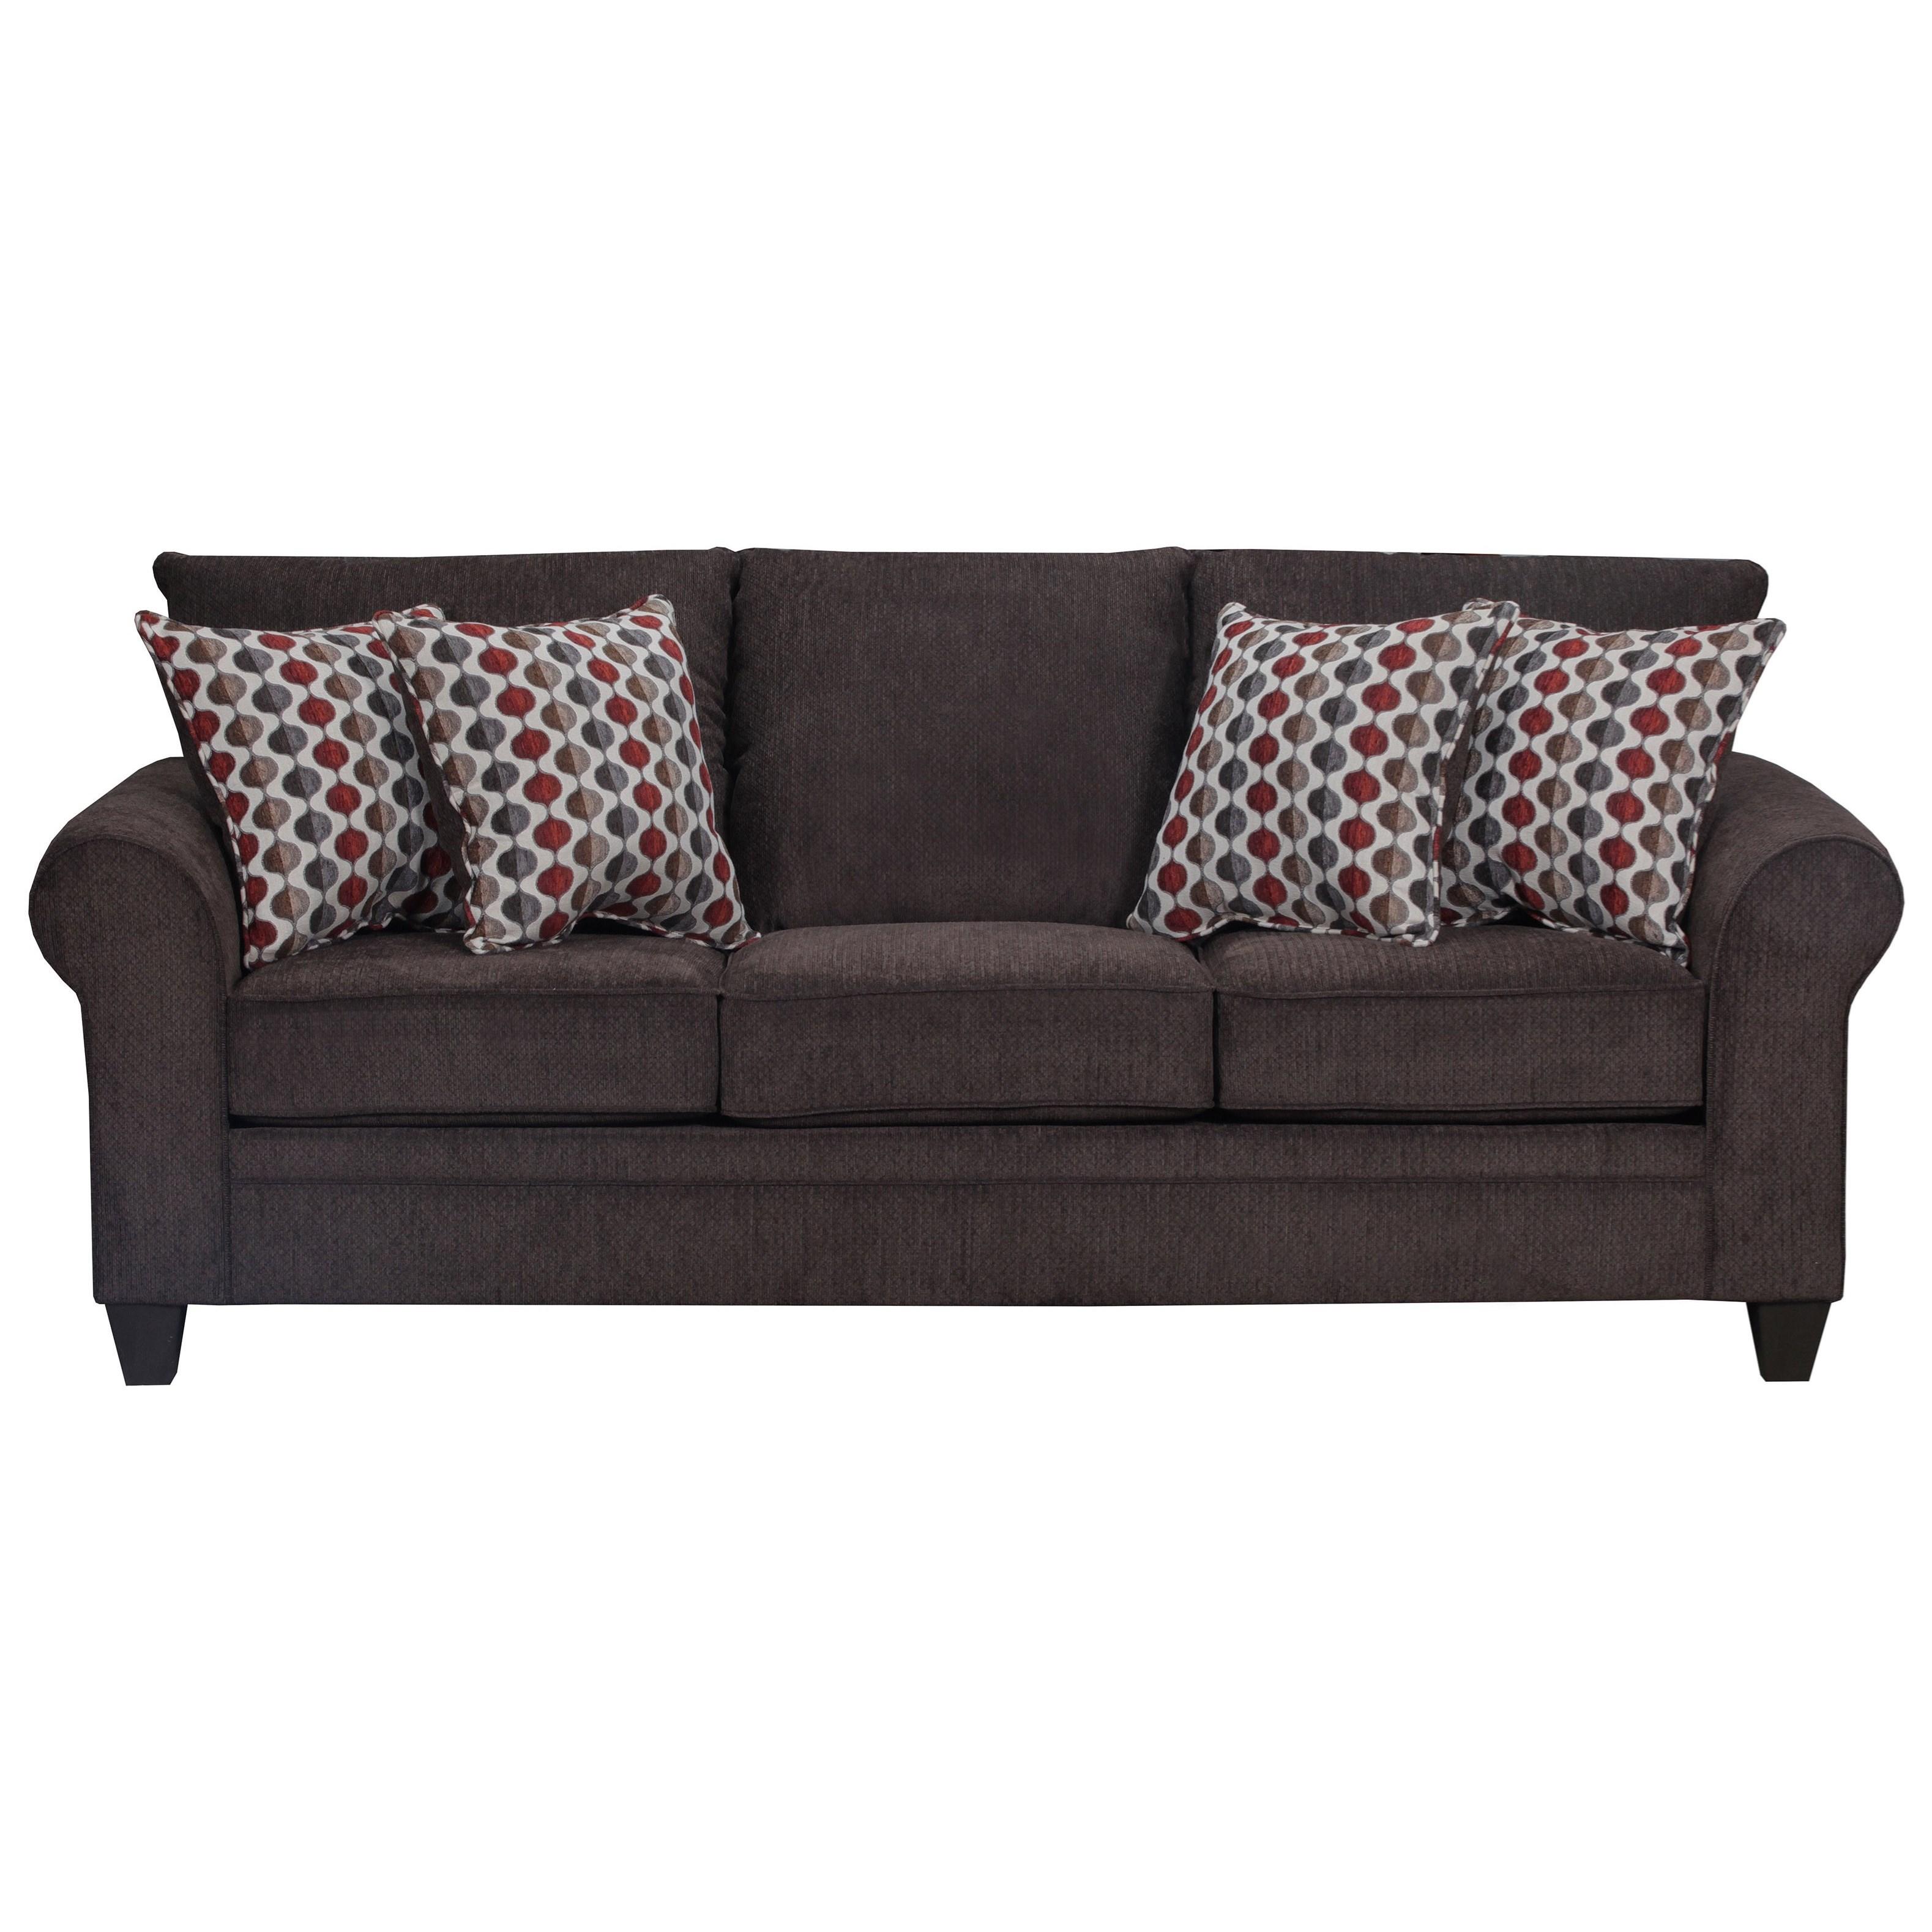 United Furniture Industries 1647 Transitional Sofa - Item Number: 1647Sofa-AlbanyMocha